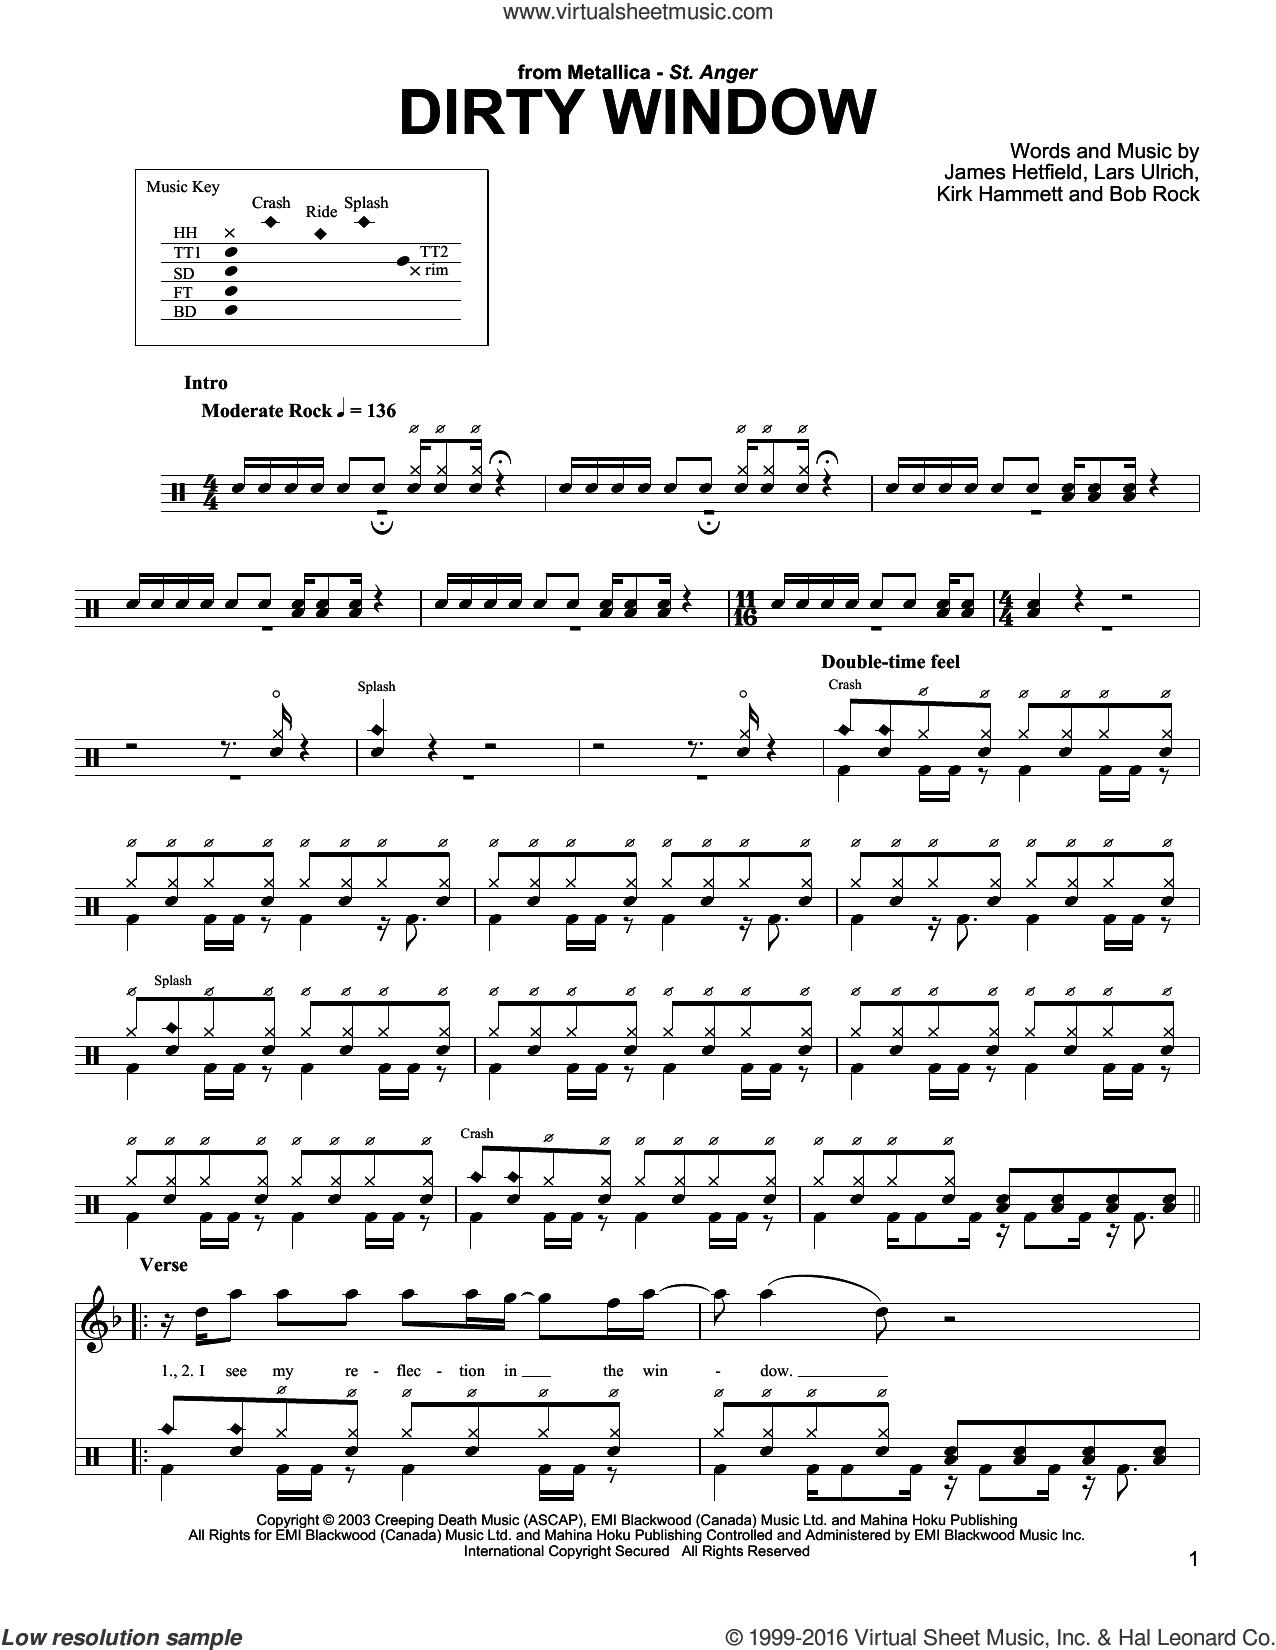 Dirty Window sheet music for drums by Metallica, Bob Rock, James Hetfield, Kirk Hammett and Lars Ulrich, intermediate skill level